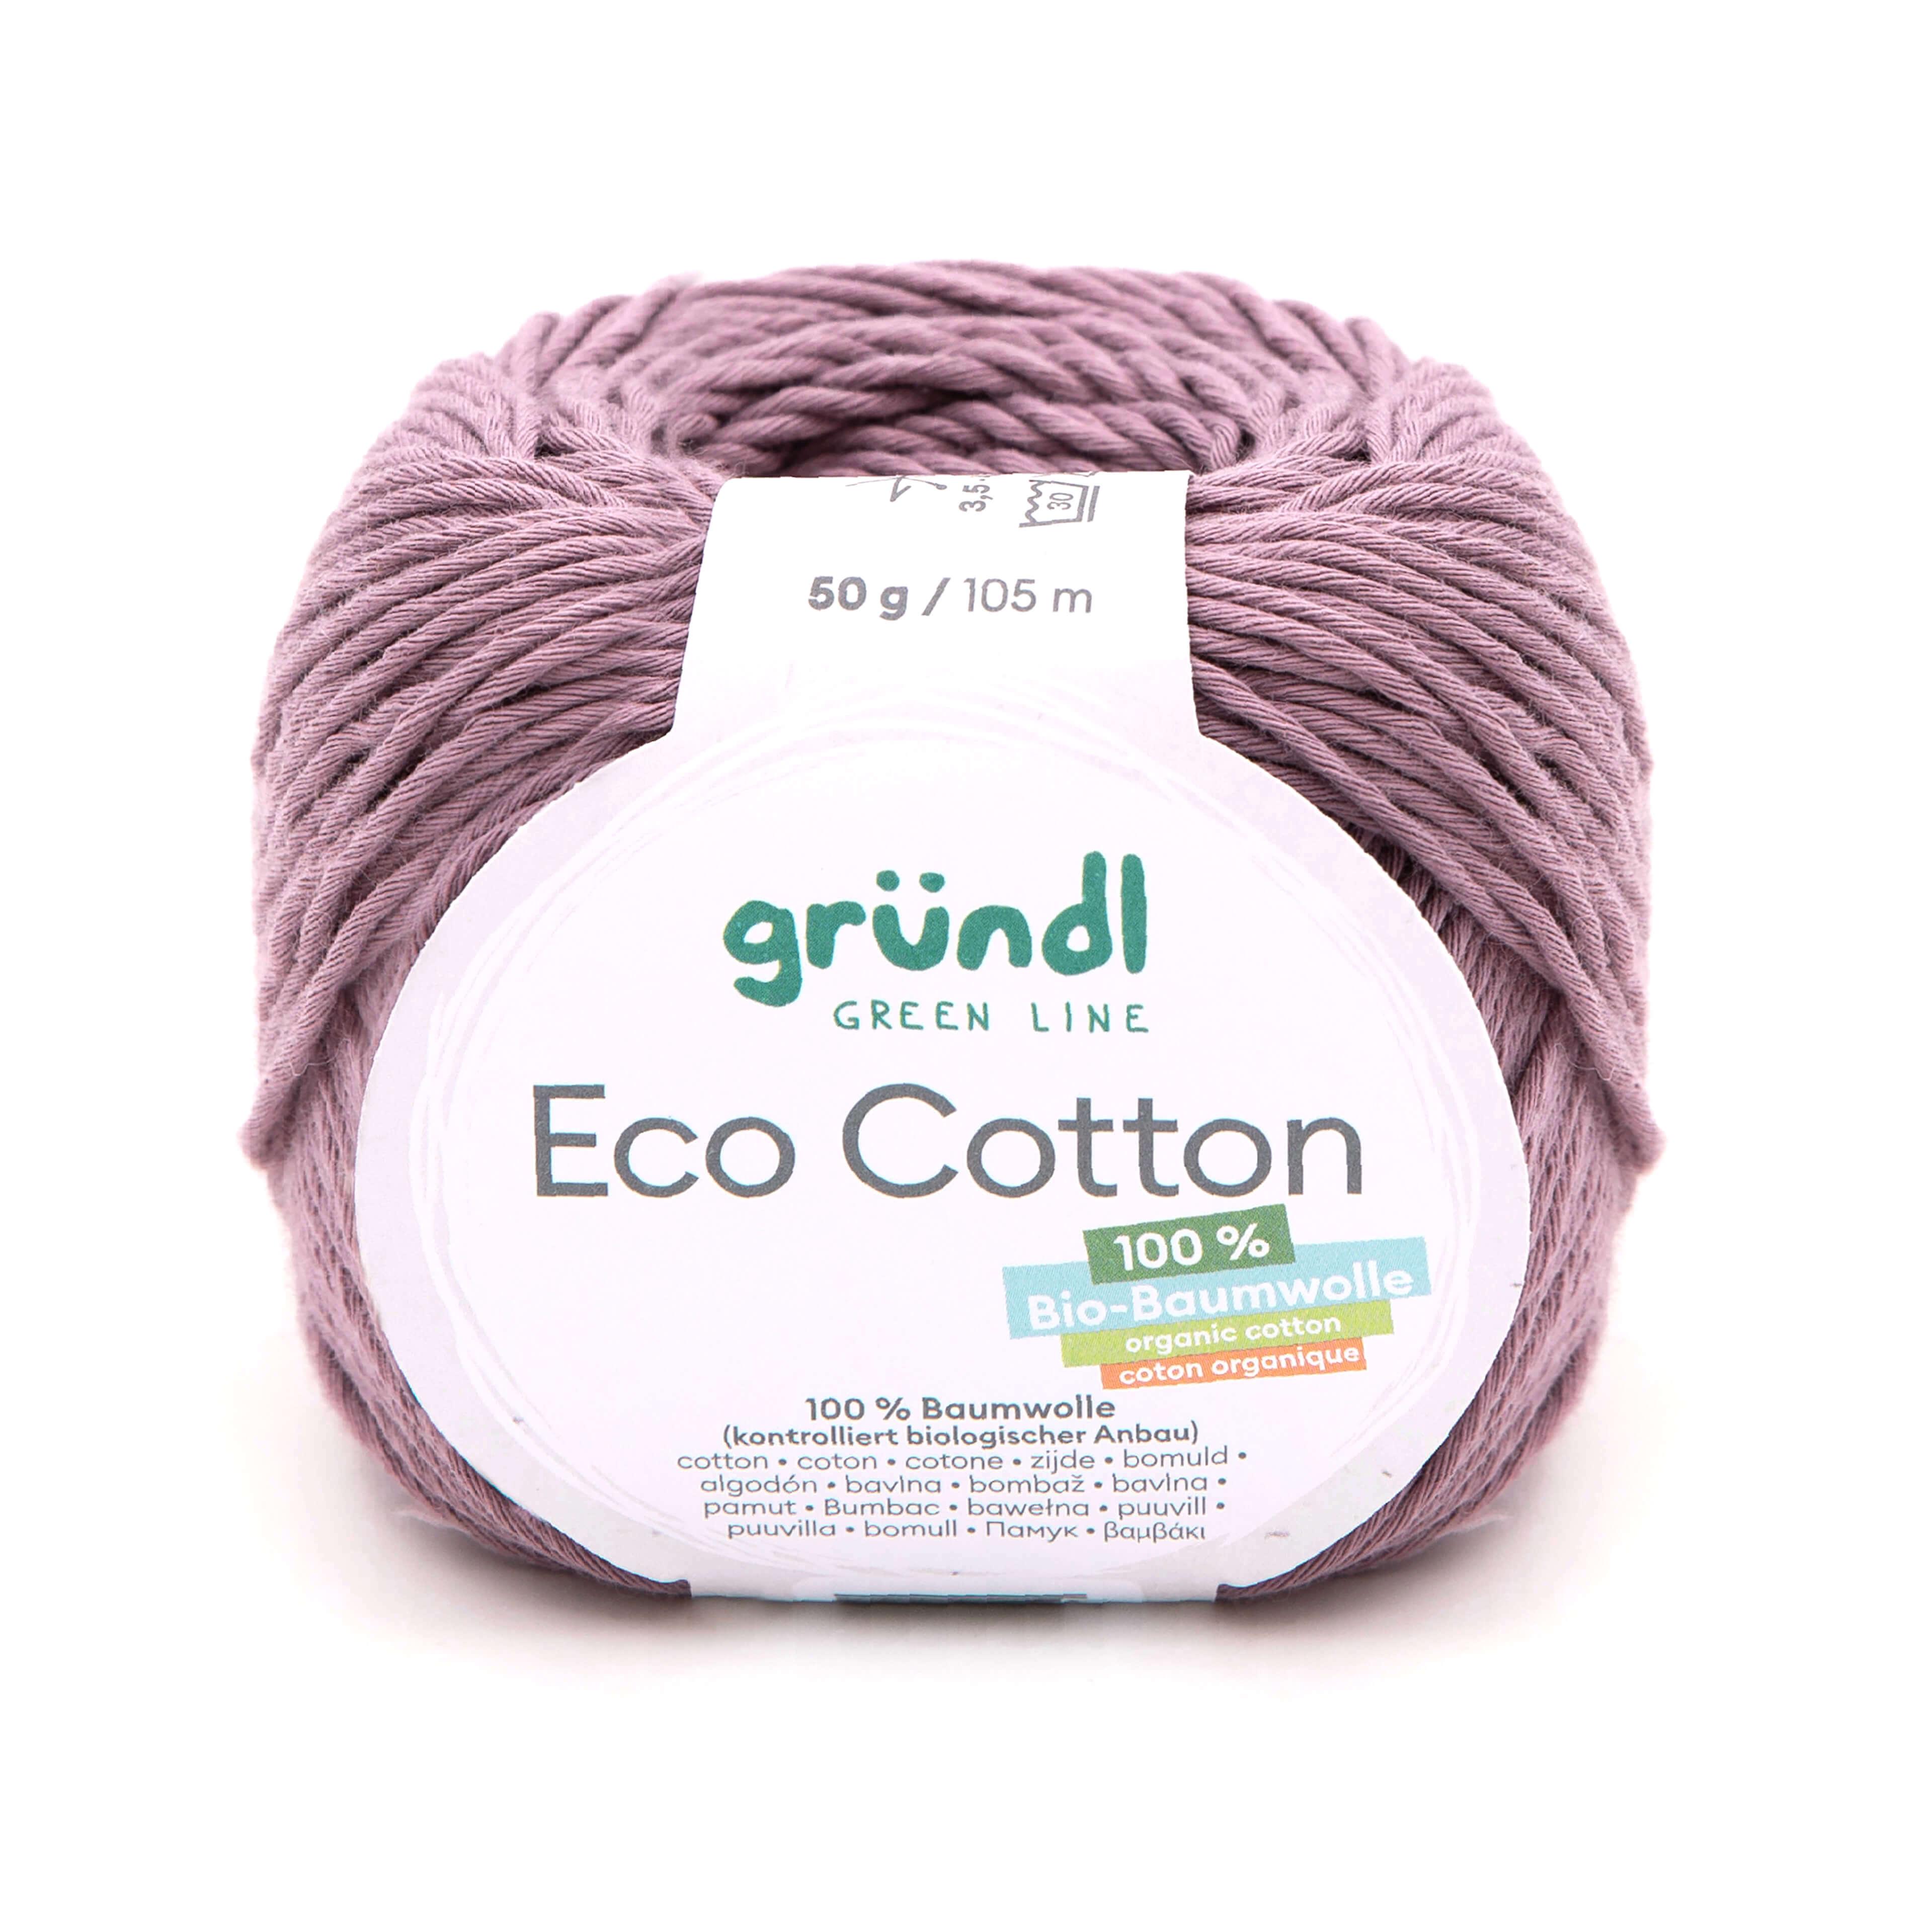 Eco Cotton